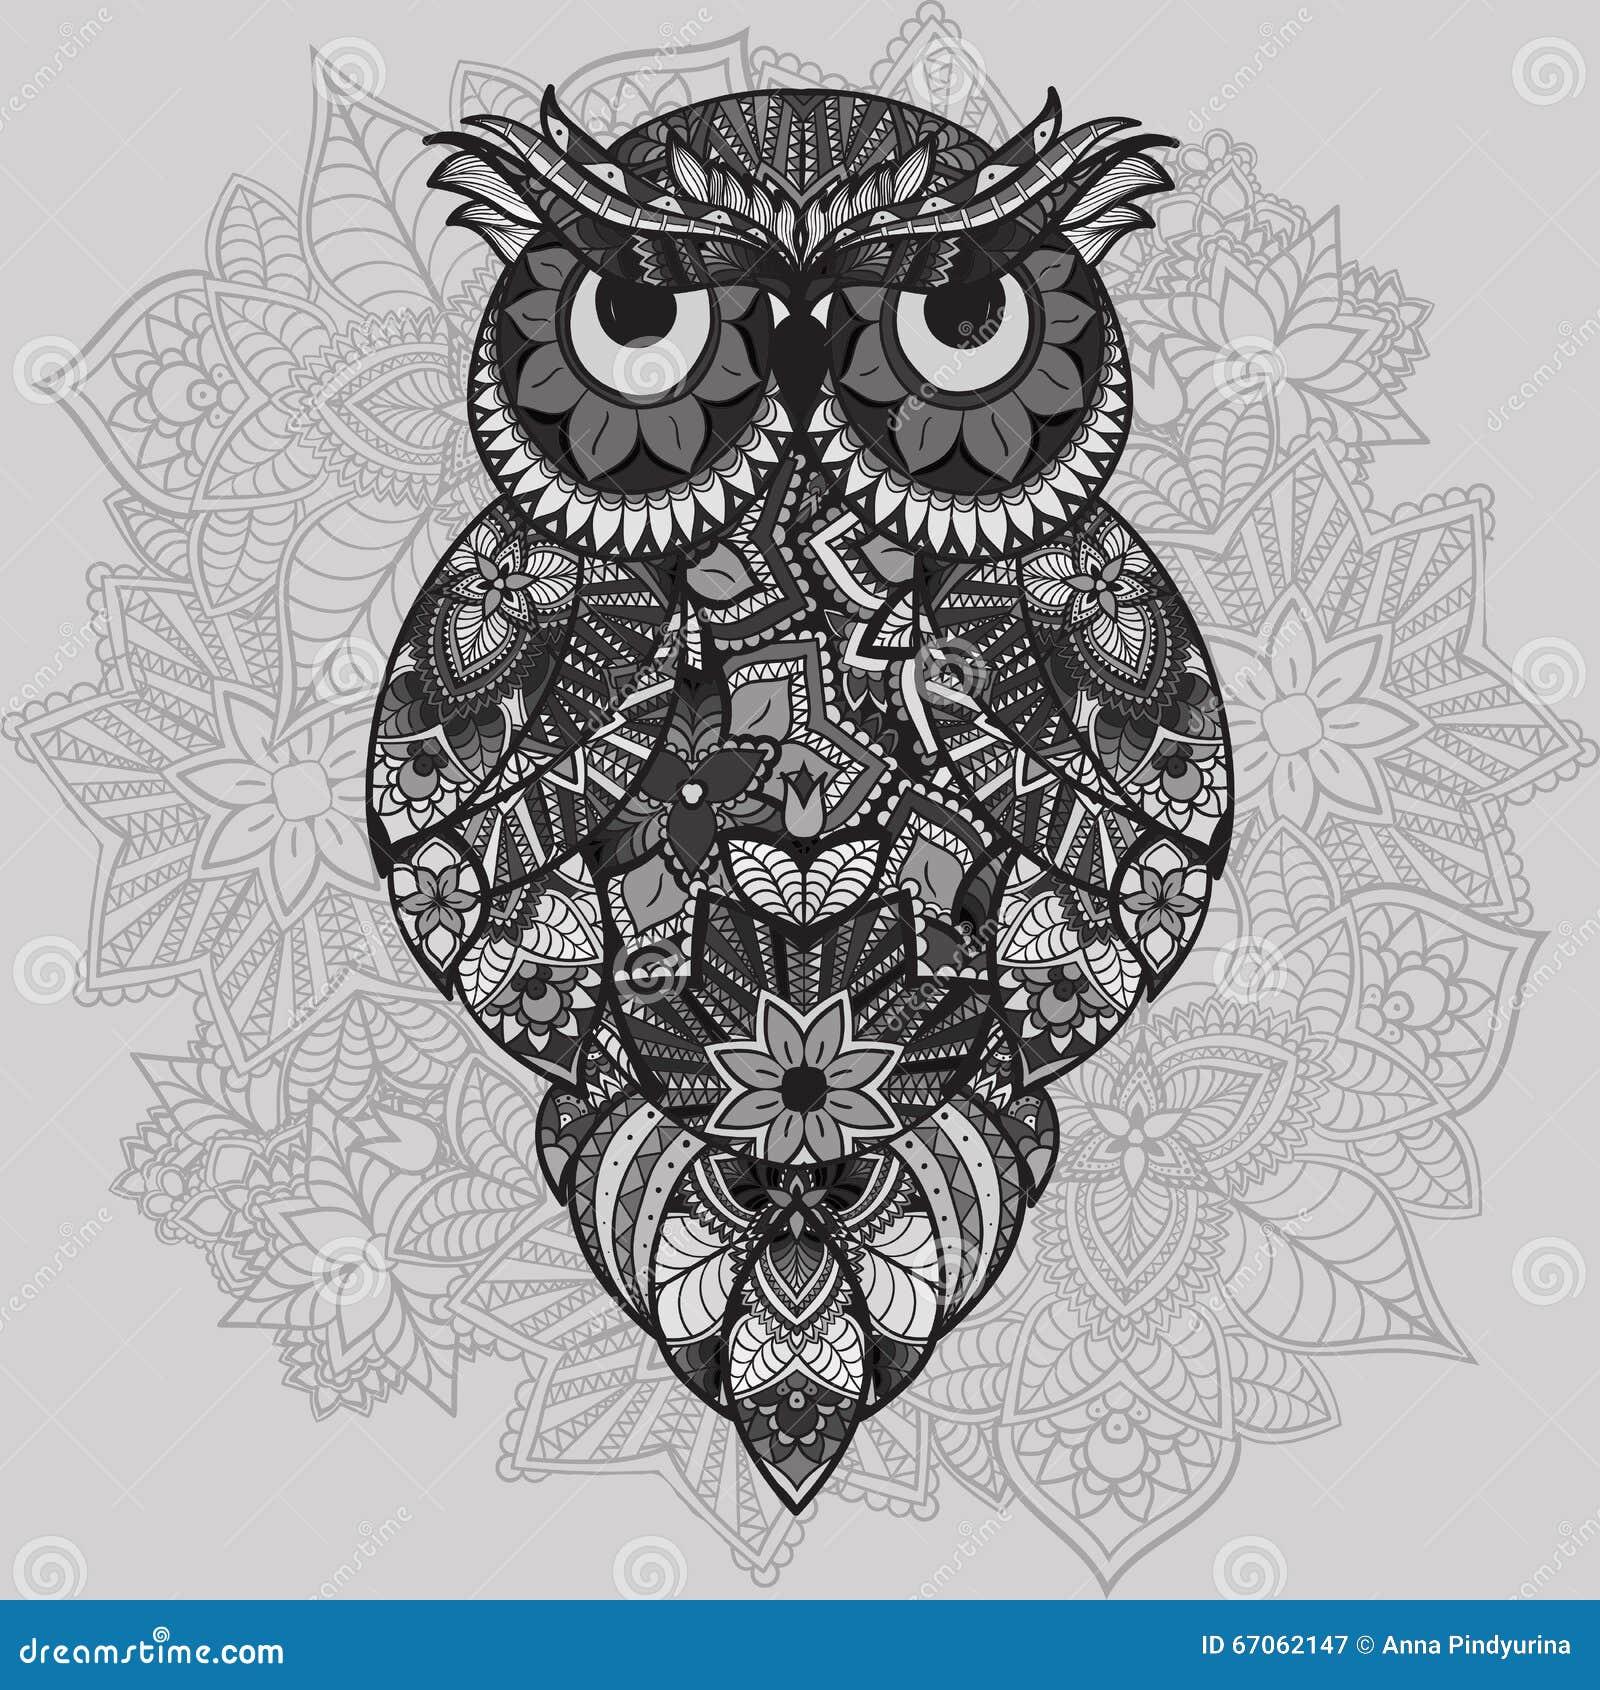 Buho Tatuaje Mandala búho modelado del vector en el fondo ornamental de la